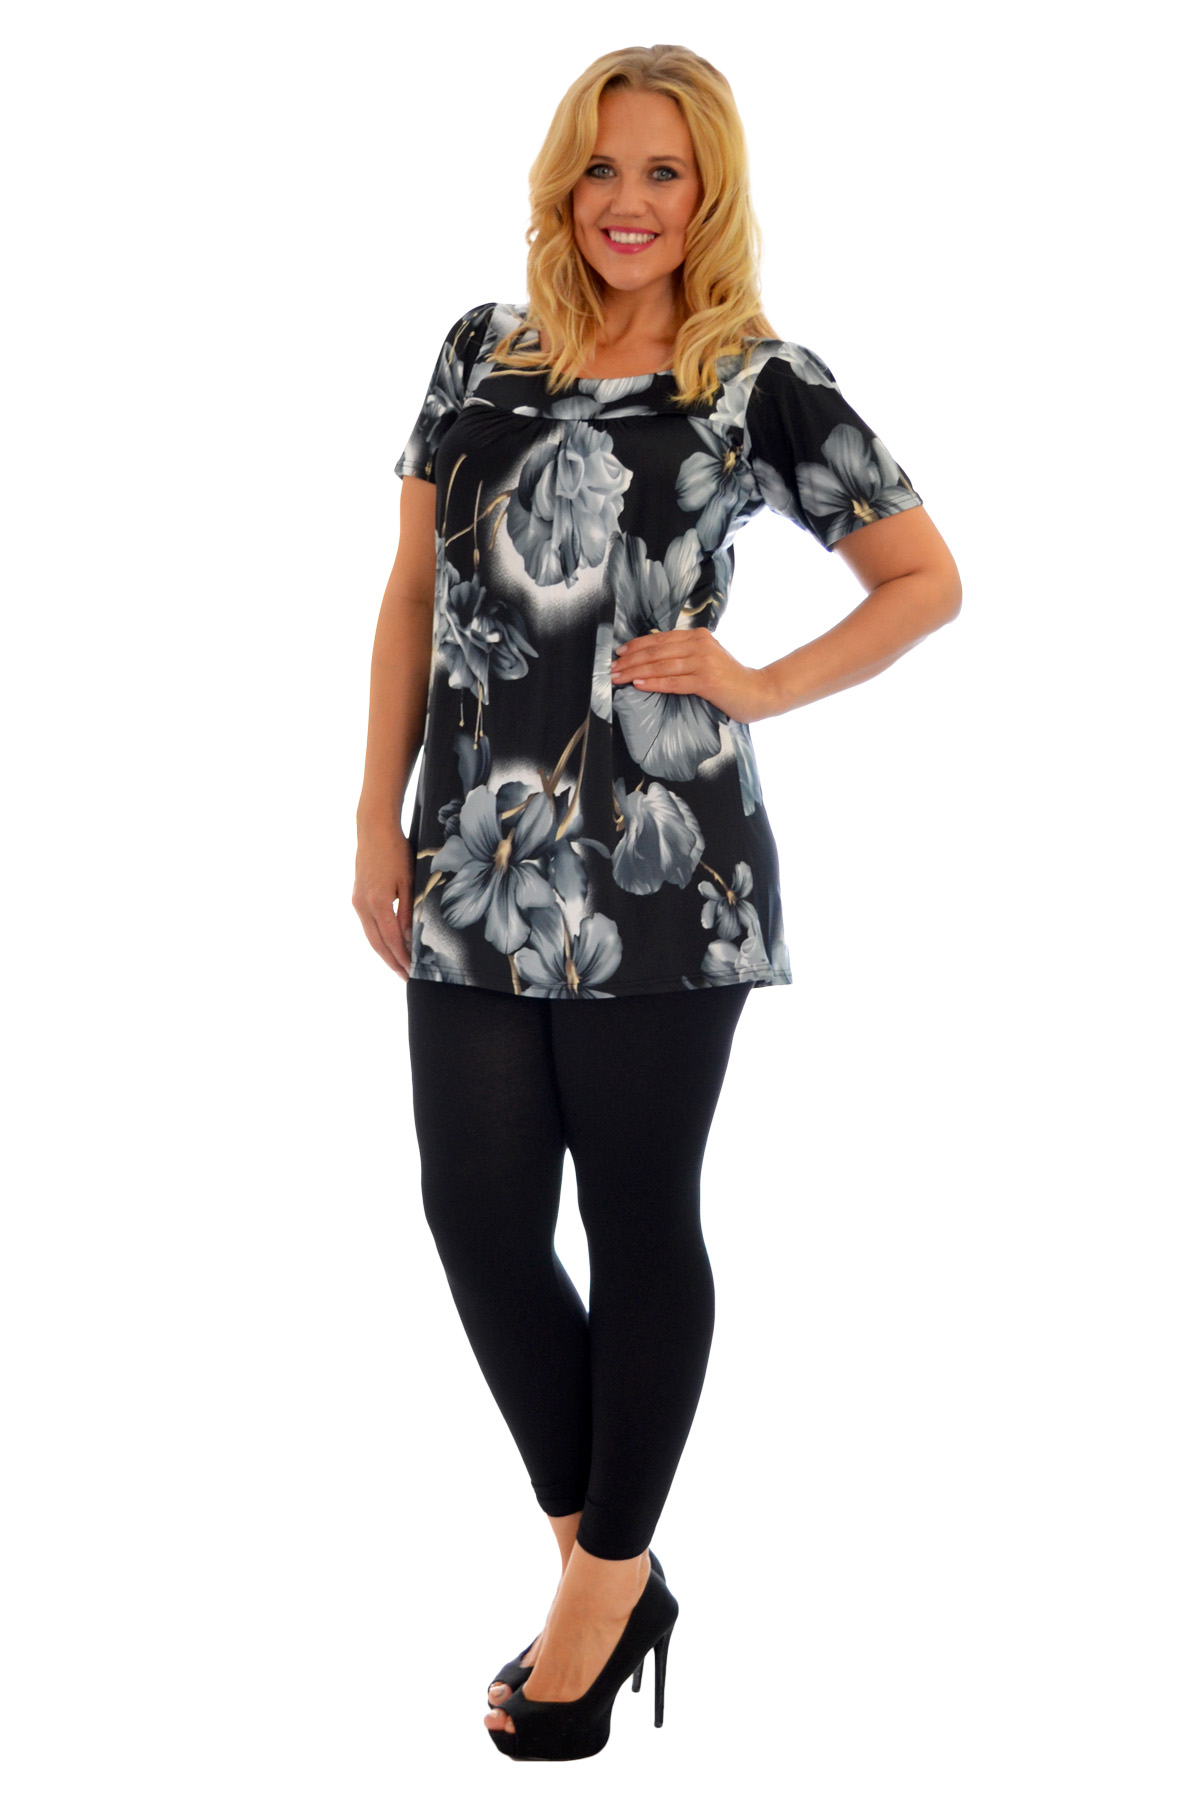 Womens Top Floral Print Ladies Tunic Short Sleeve Shirt Smock Plus Size Nouvelle